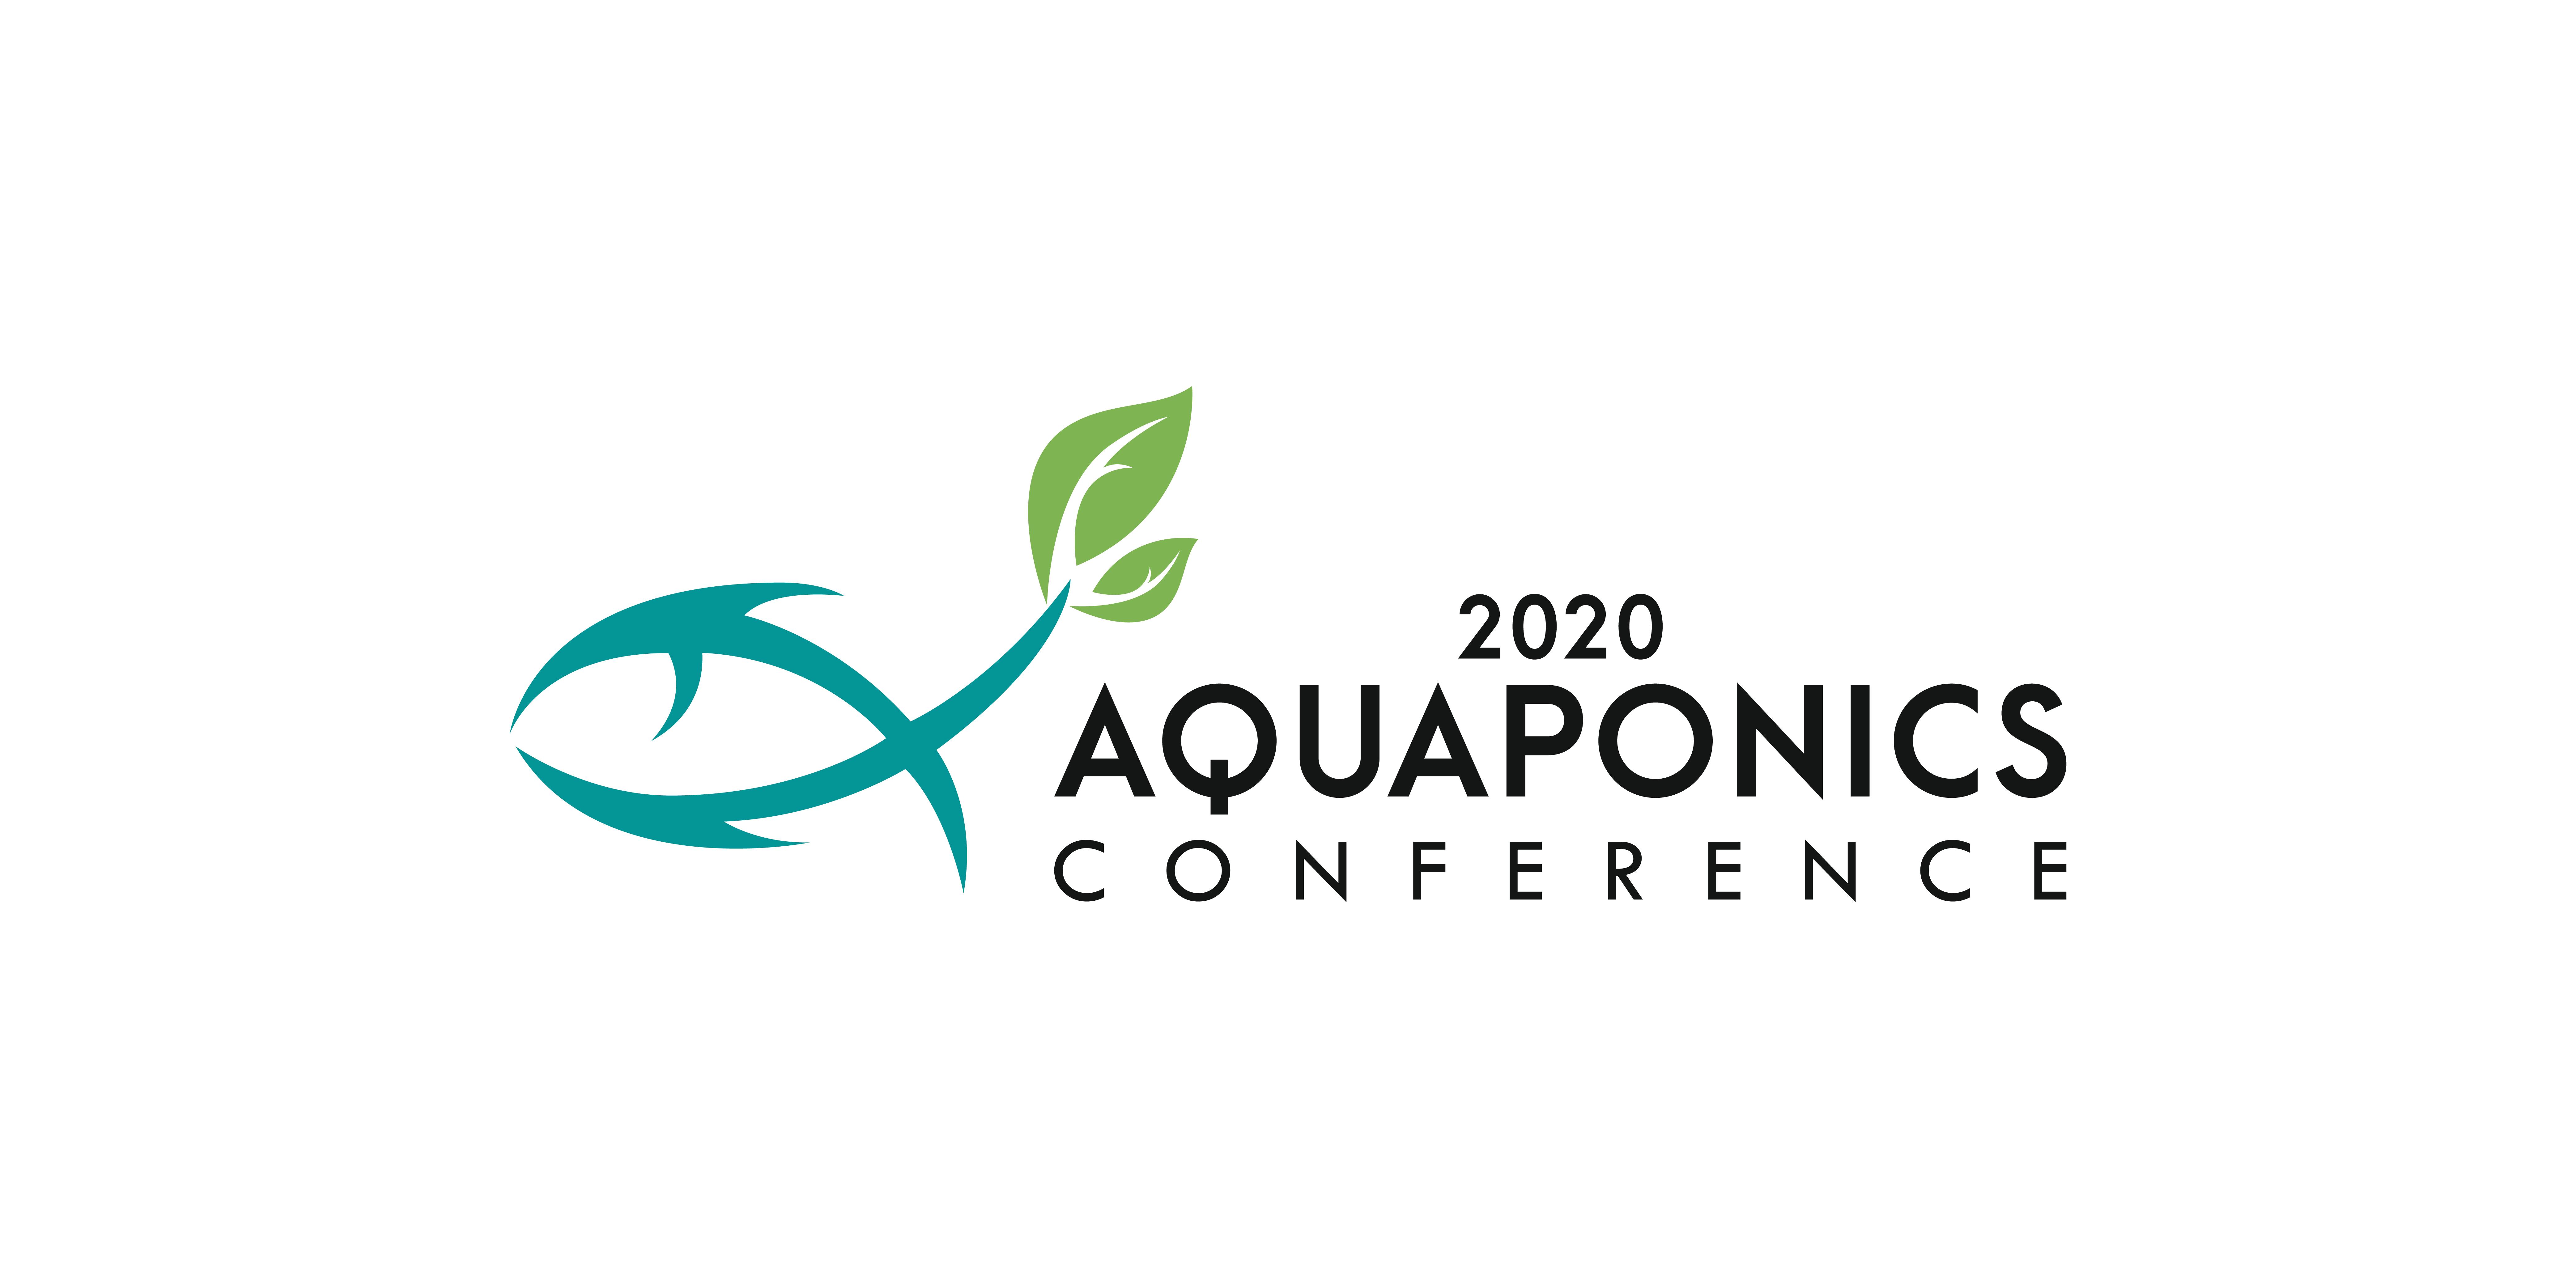 Aquaponics Association